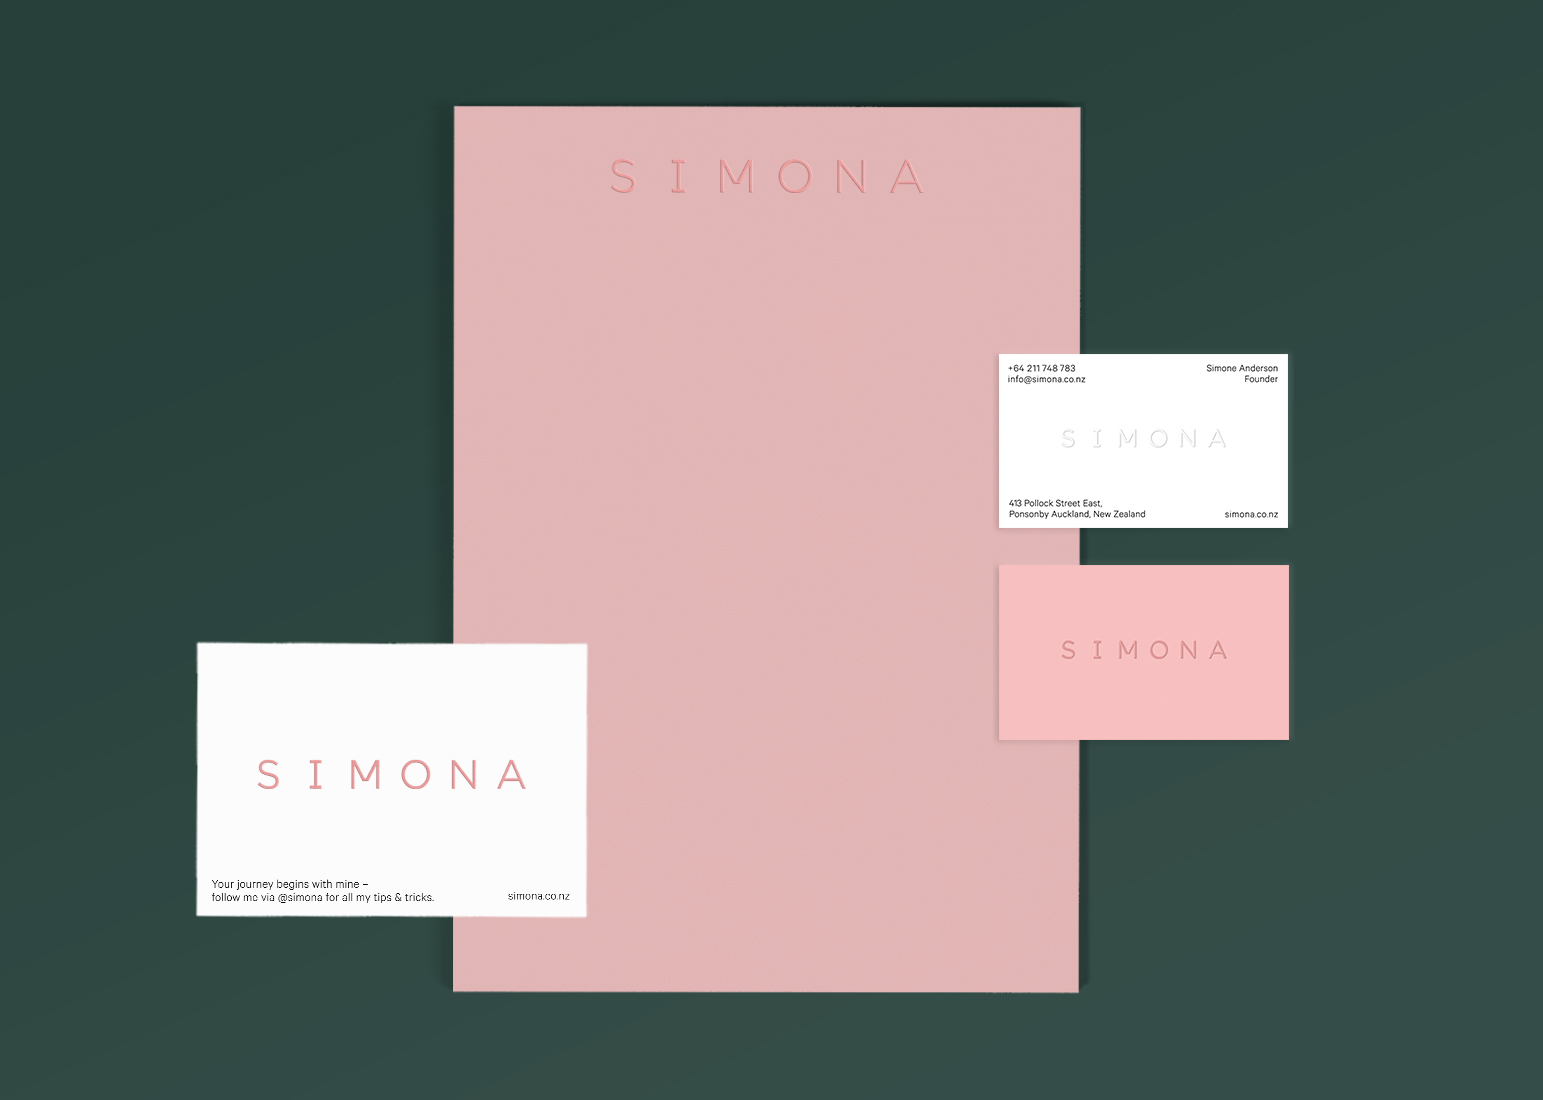 Simona_Project3